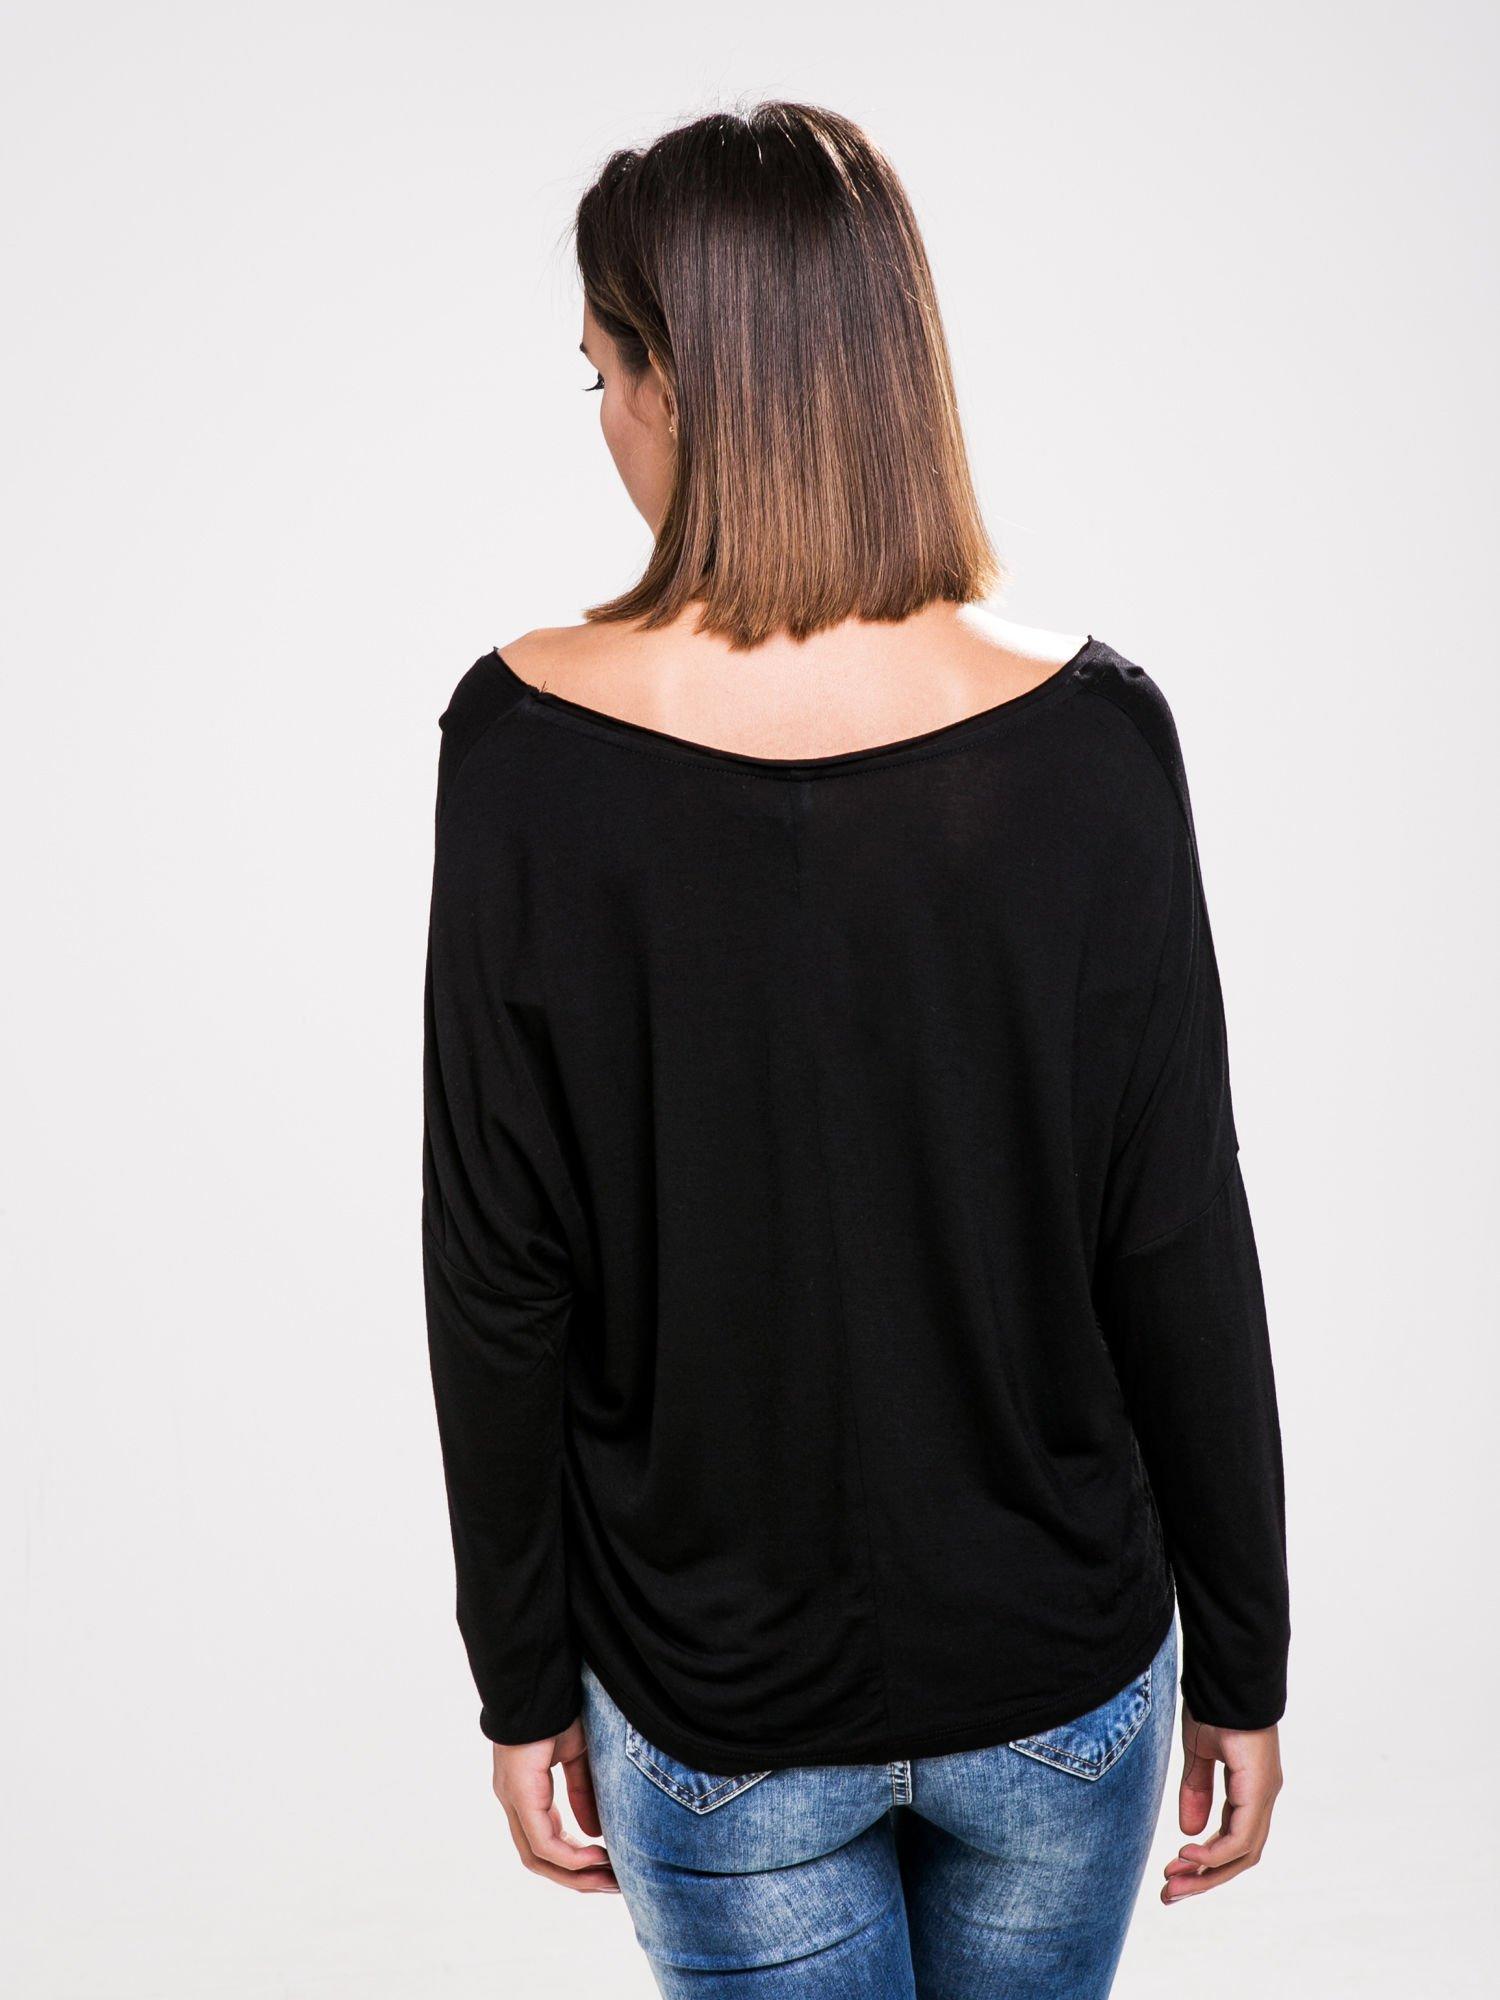 STRADIVARIUS Czarna bluzka z napisem BAD GIRLS HAVE MORE FUN                                  zdj.                                  2